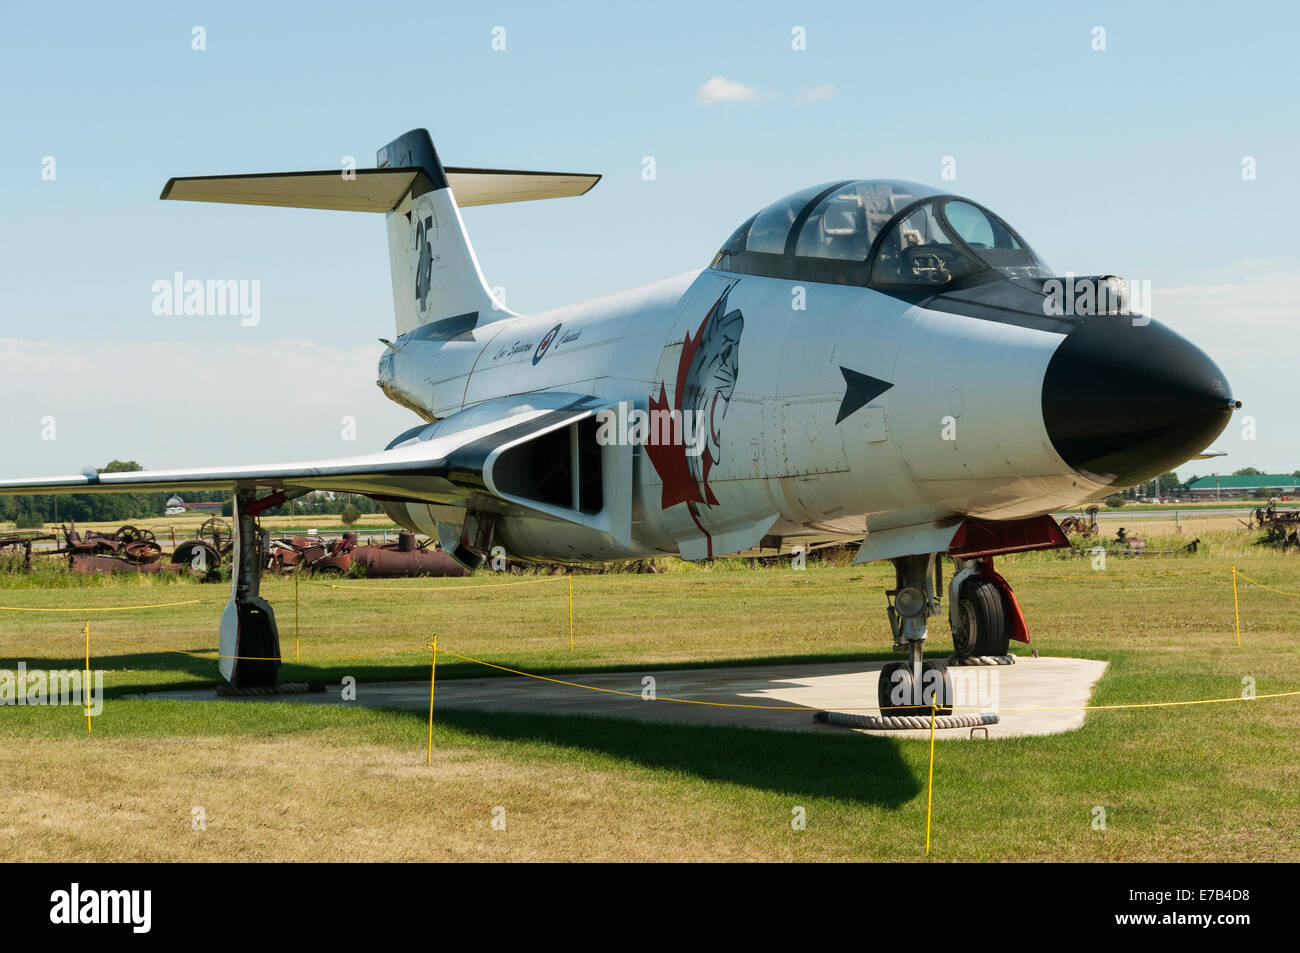 Elk203-5700 Canada, Alberta, Reynolds-Alberta Museum, vintage fighter jets - Stock Image